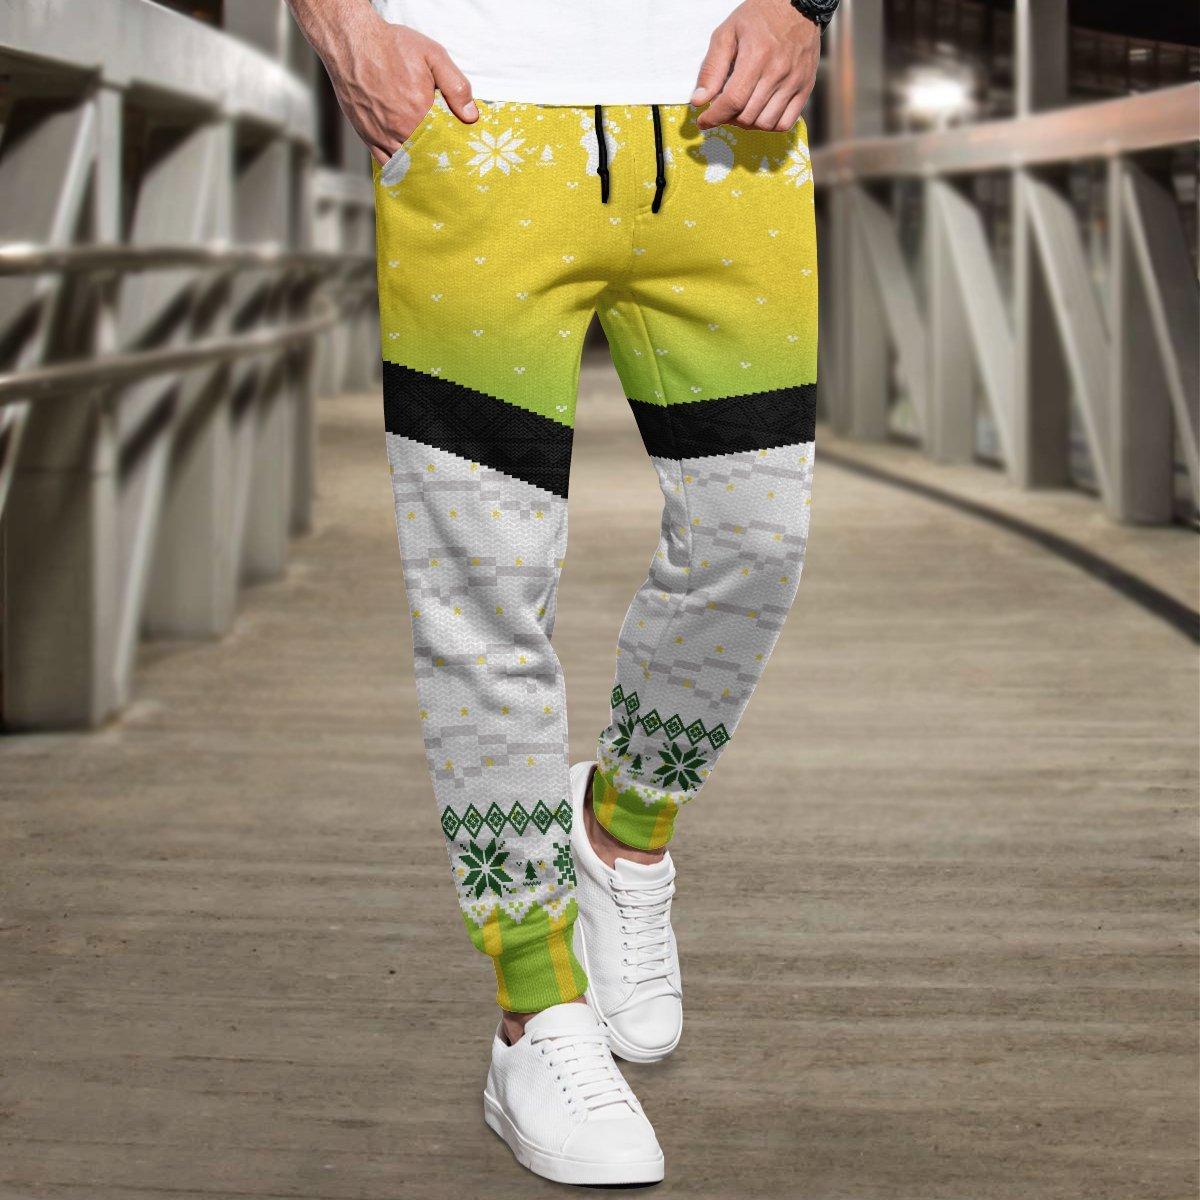 team itachiyama christmas jogger pants 670496 - Otaku Treat